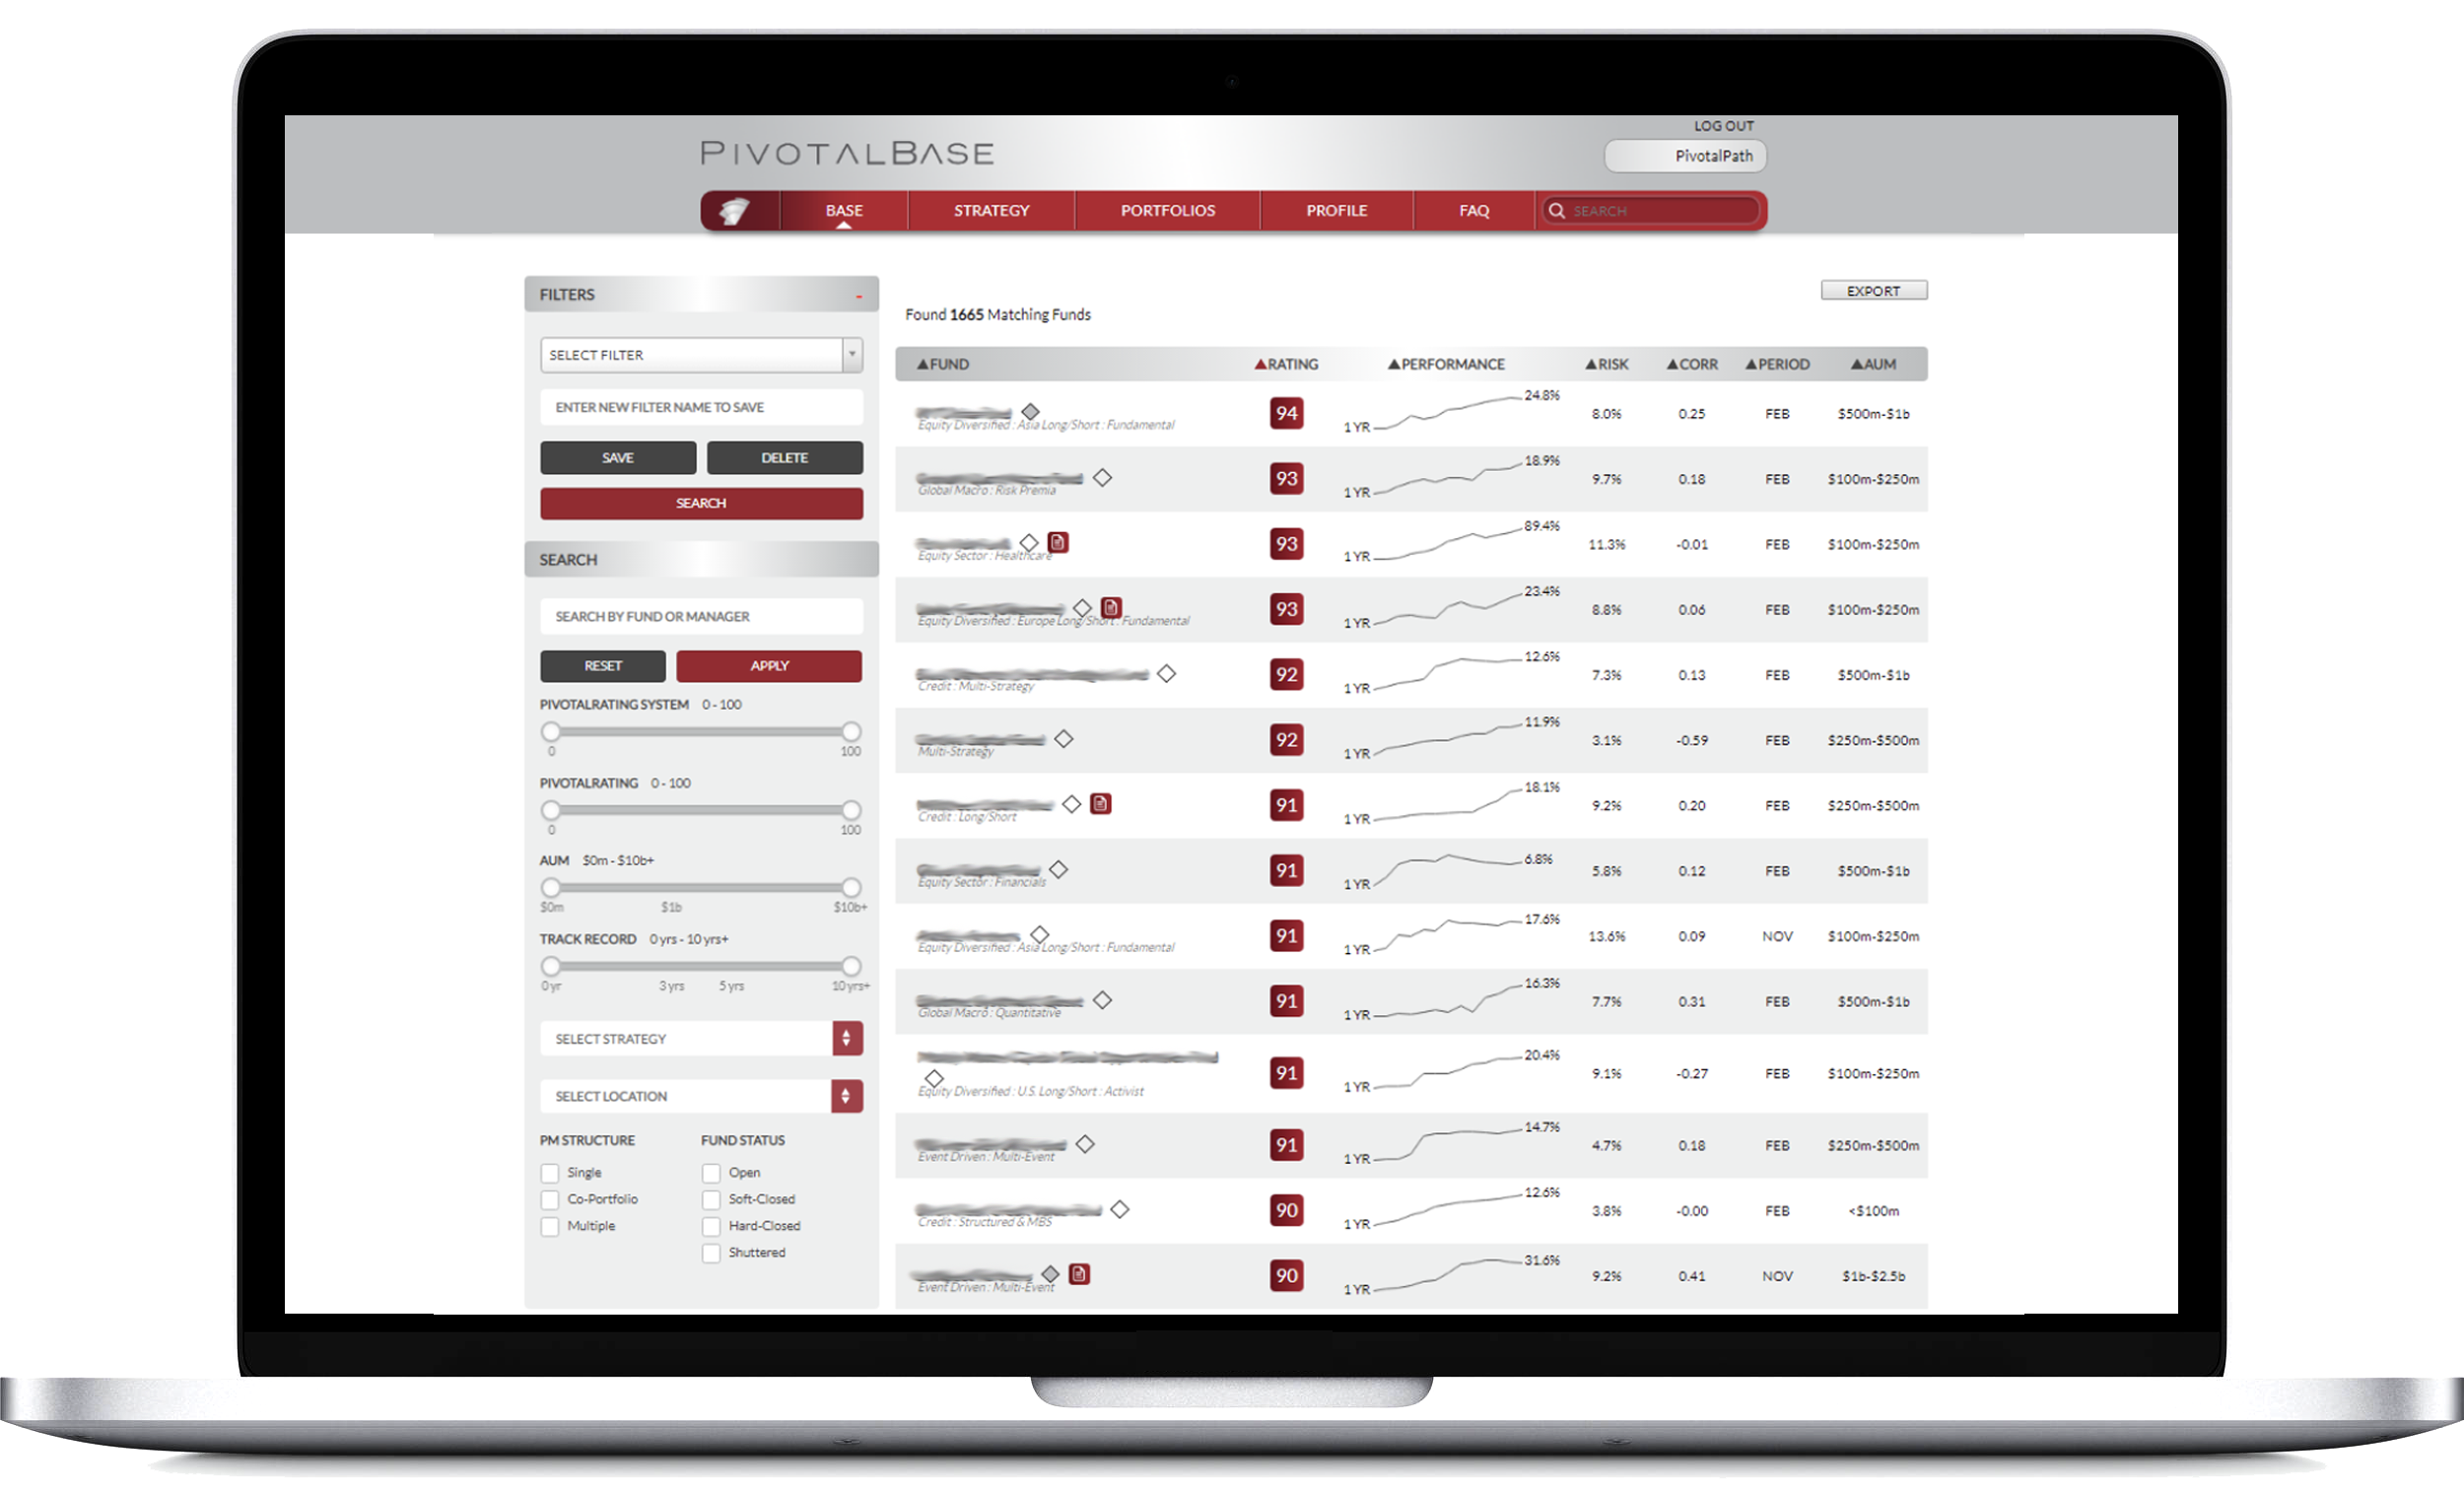 PivotalBase-Interface.png